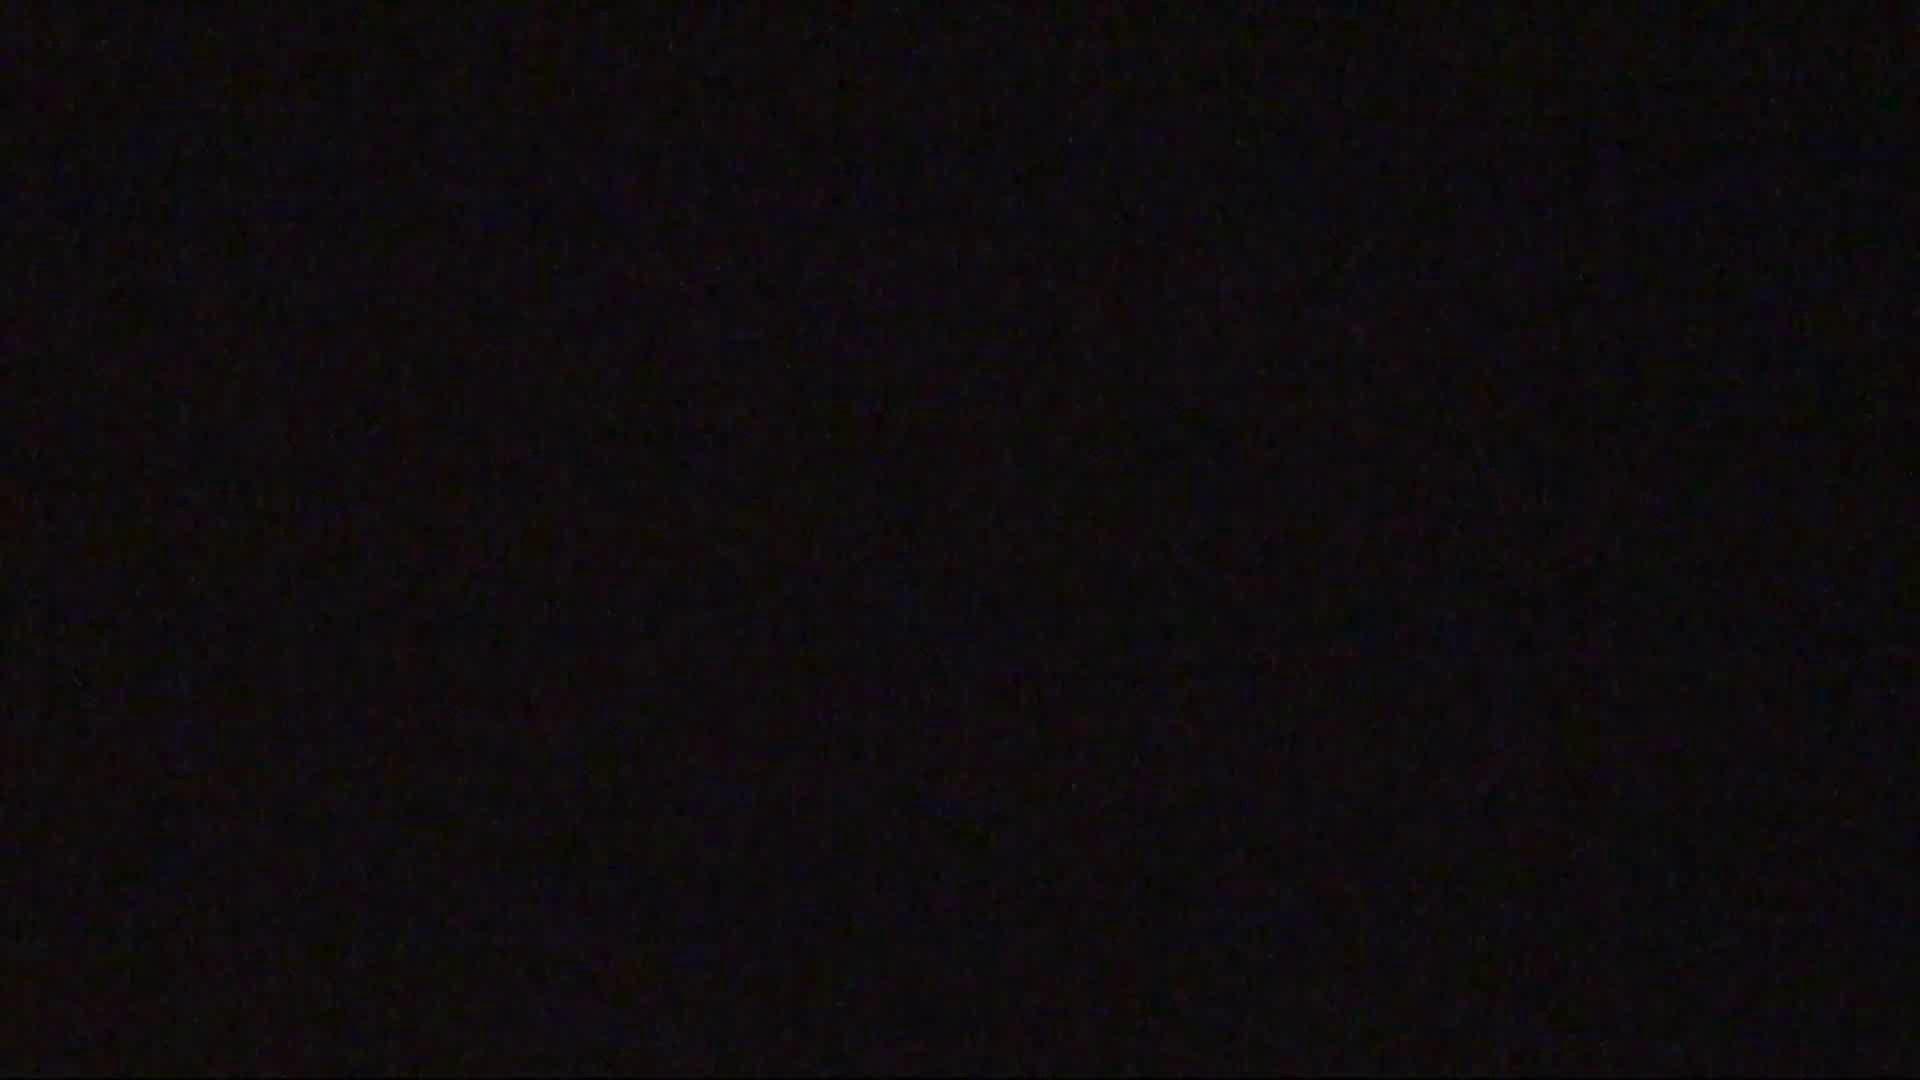 vol.02超可愛すぎる彼女の裸体をハイビジョンで!至近距離での眺め最高! 覗き ワレメ無修正動画無料 78pic 35